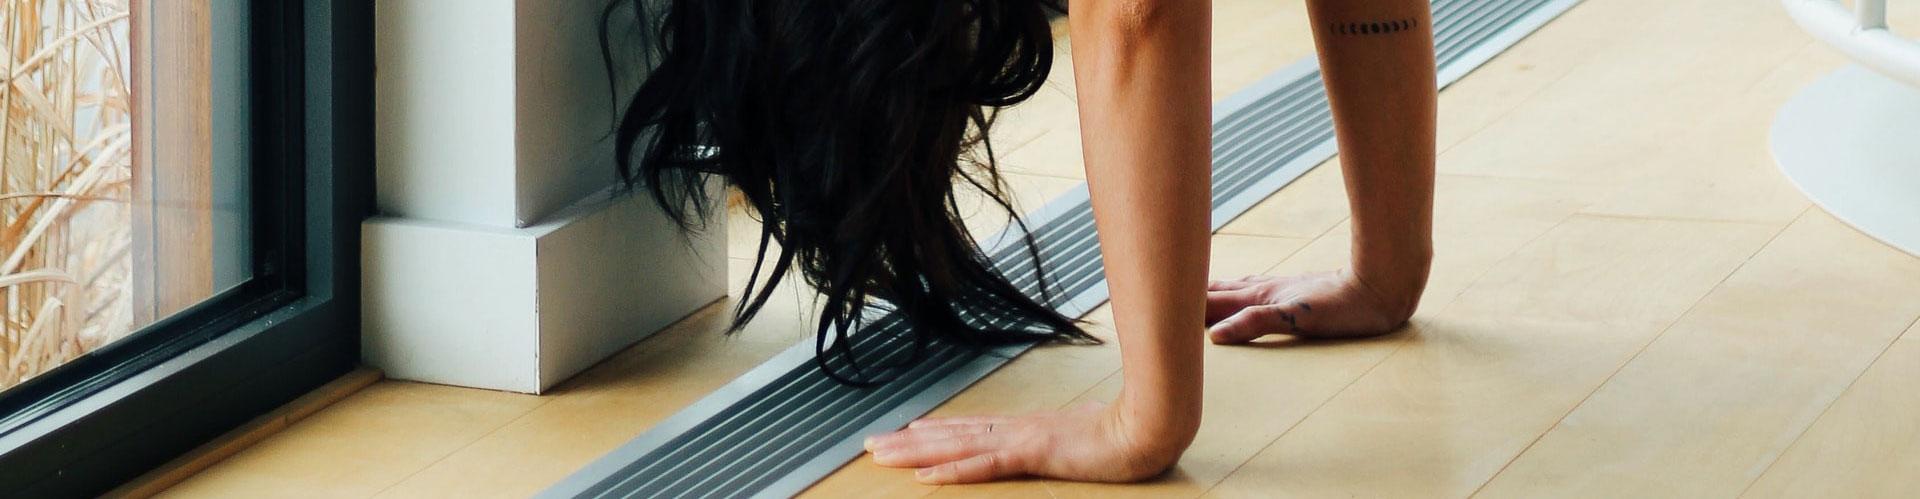 Schadevergoeding na sportongeval tijdens gymles | LetselPro